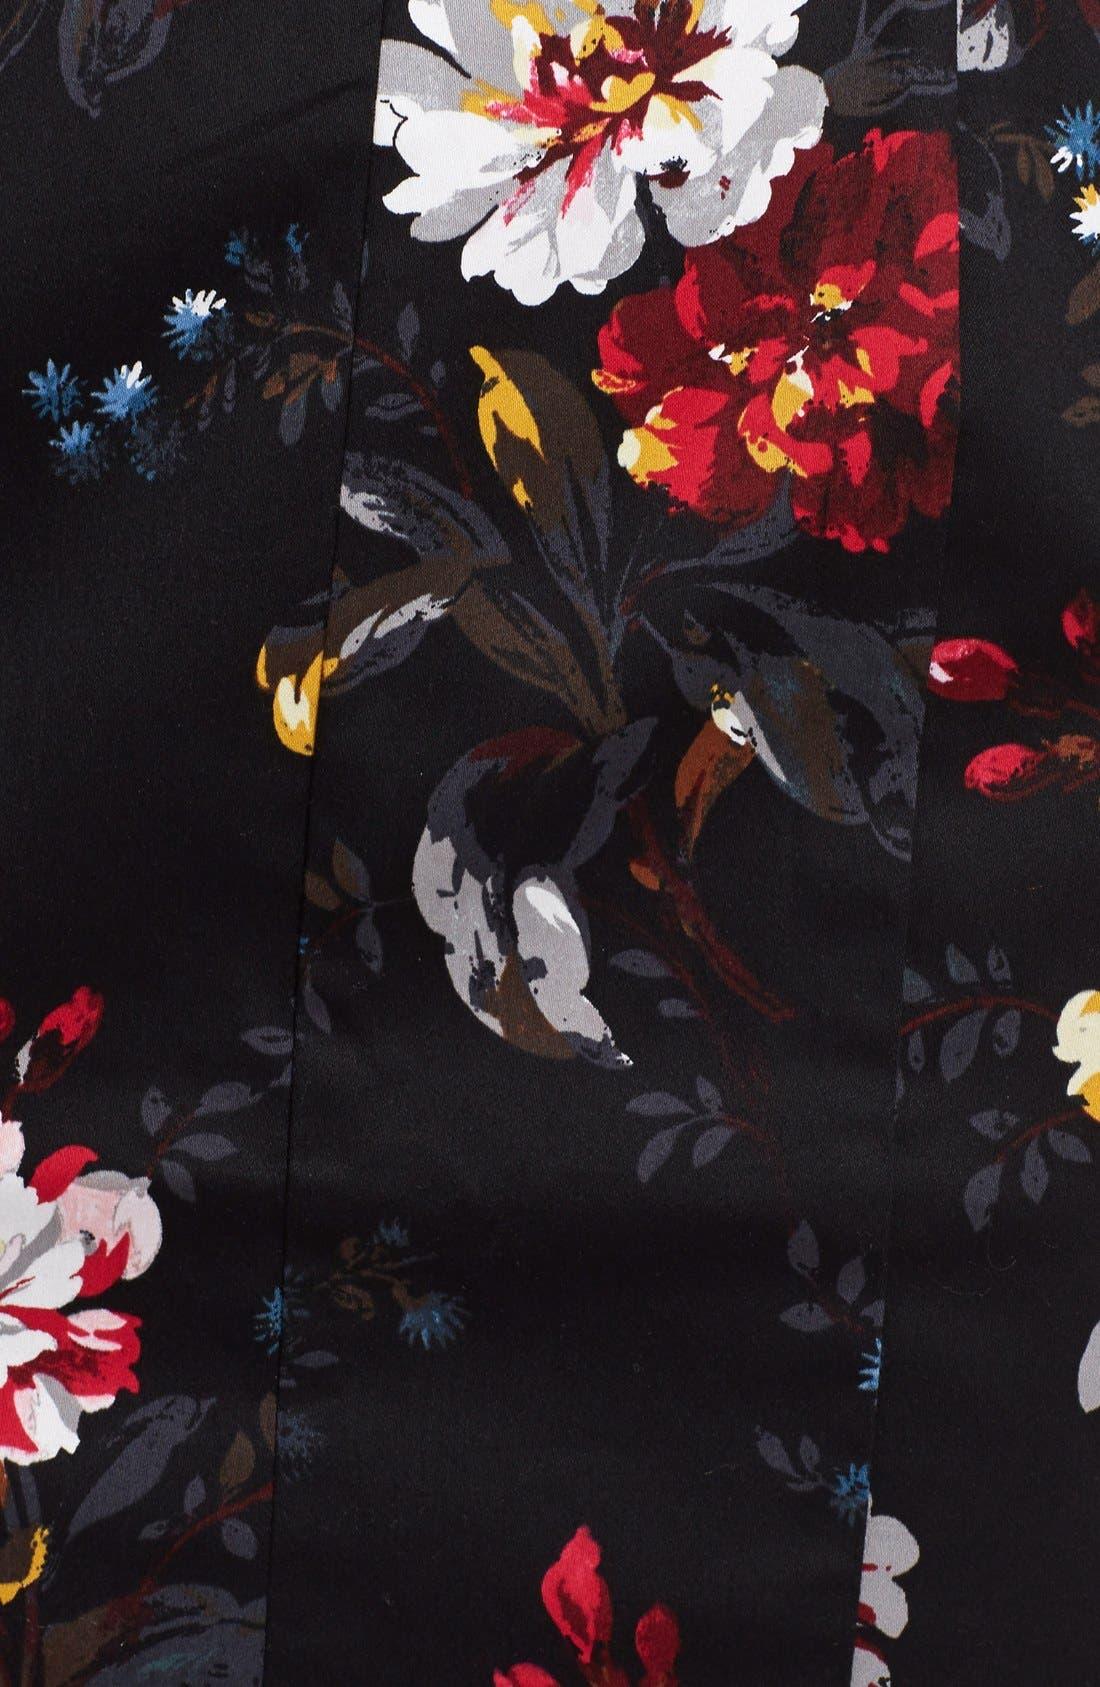 'Gardini' Floral Print Cotton Sheath Dress,                             Alternate thumbnail 3, color,                             006